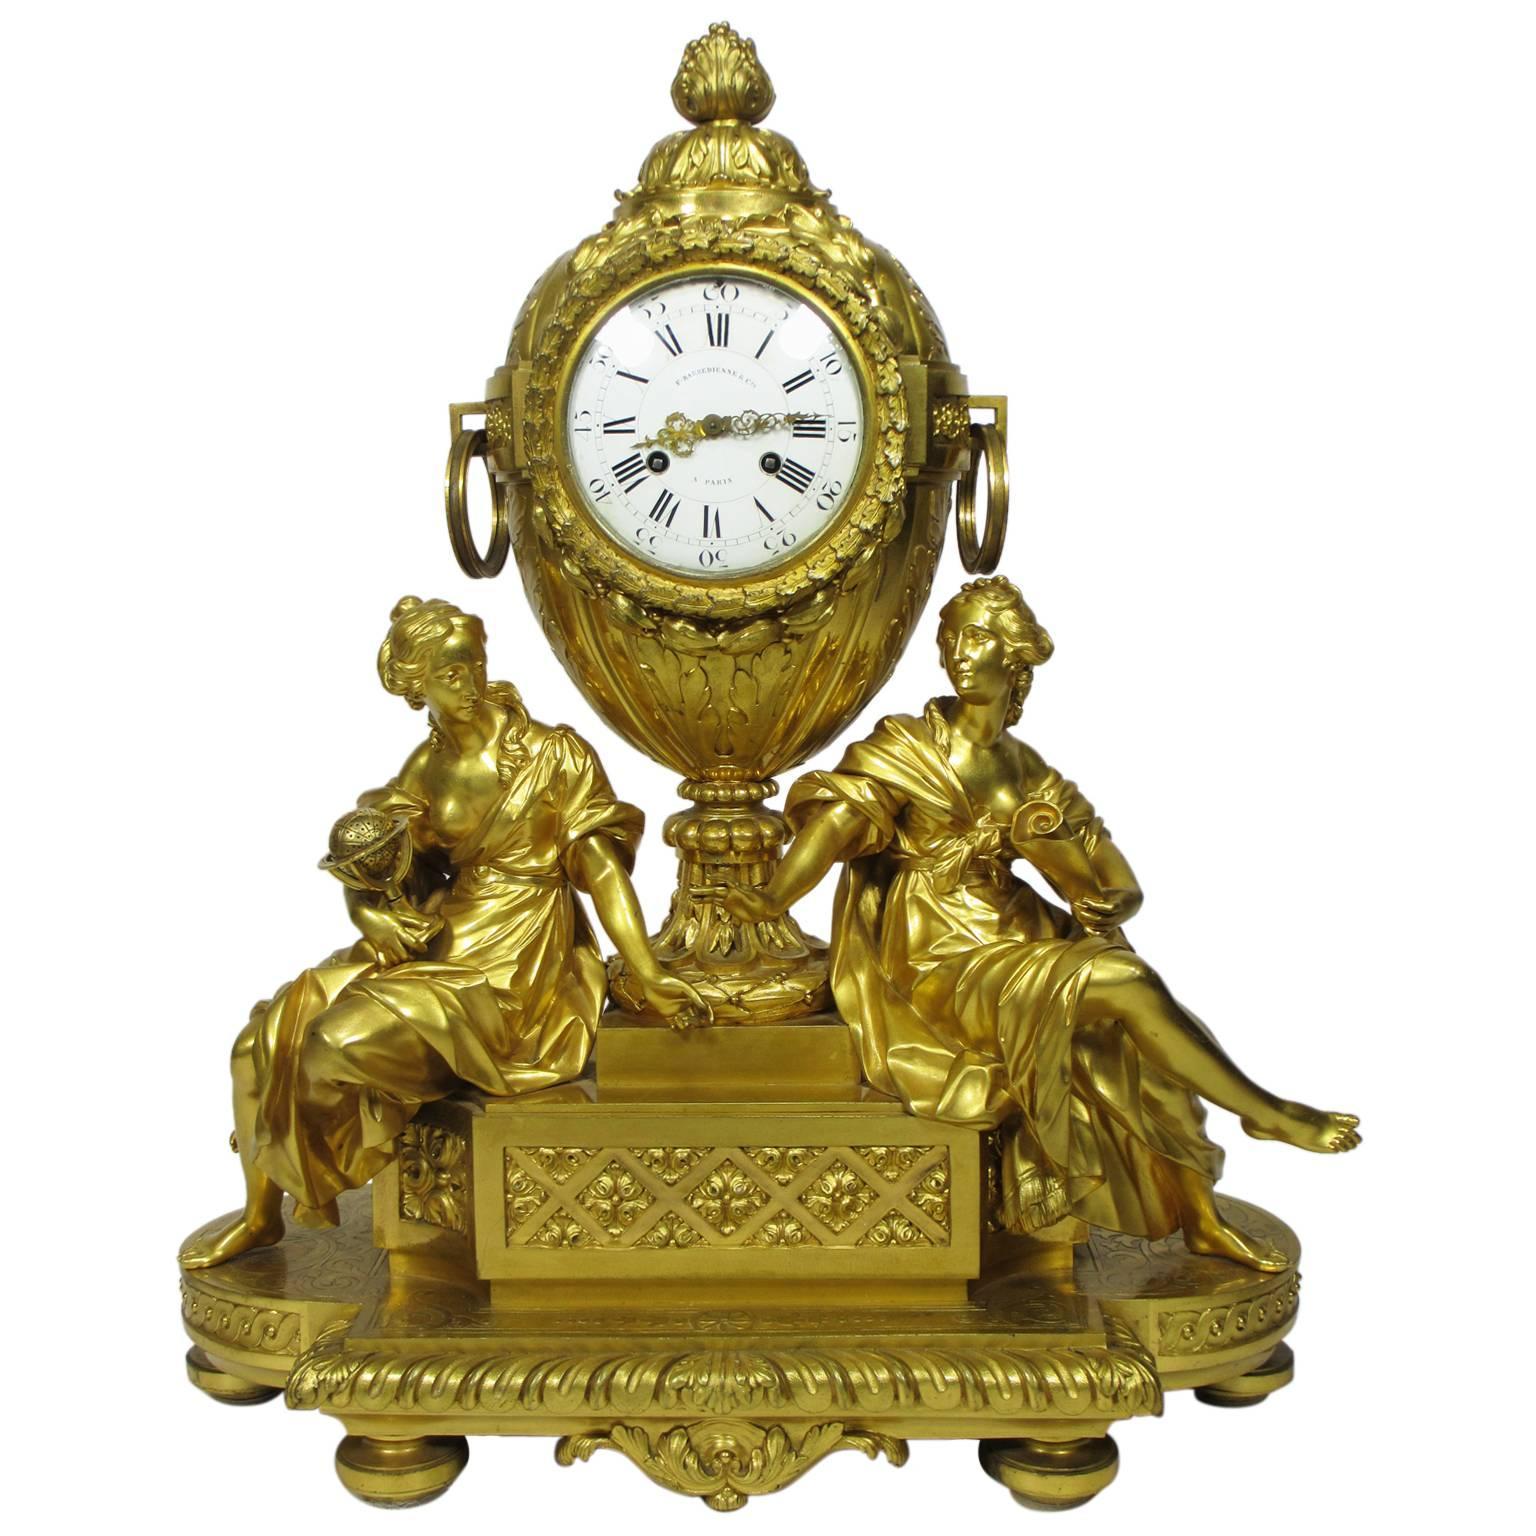 19th Century Louis XVI Style Gilt-Bronze Mantel Clock by Fedinand Barbedienne